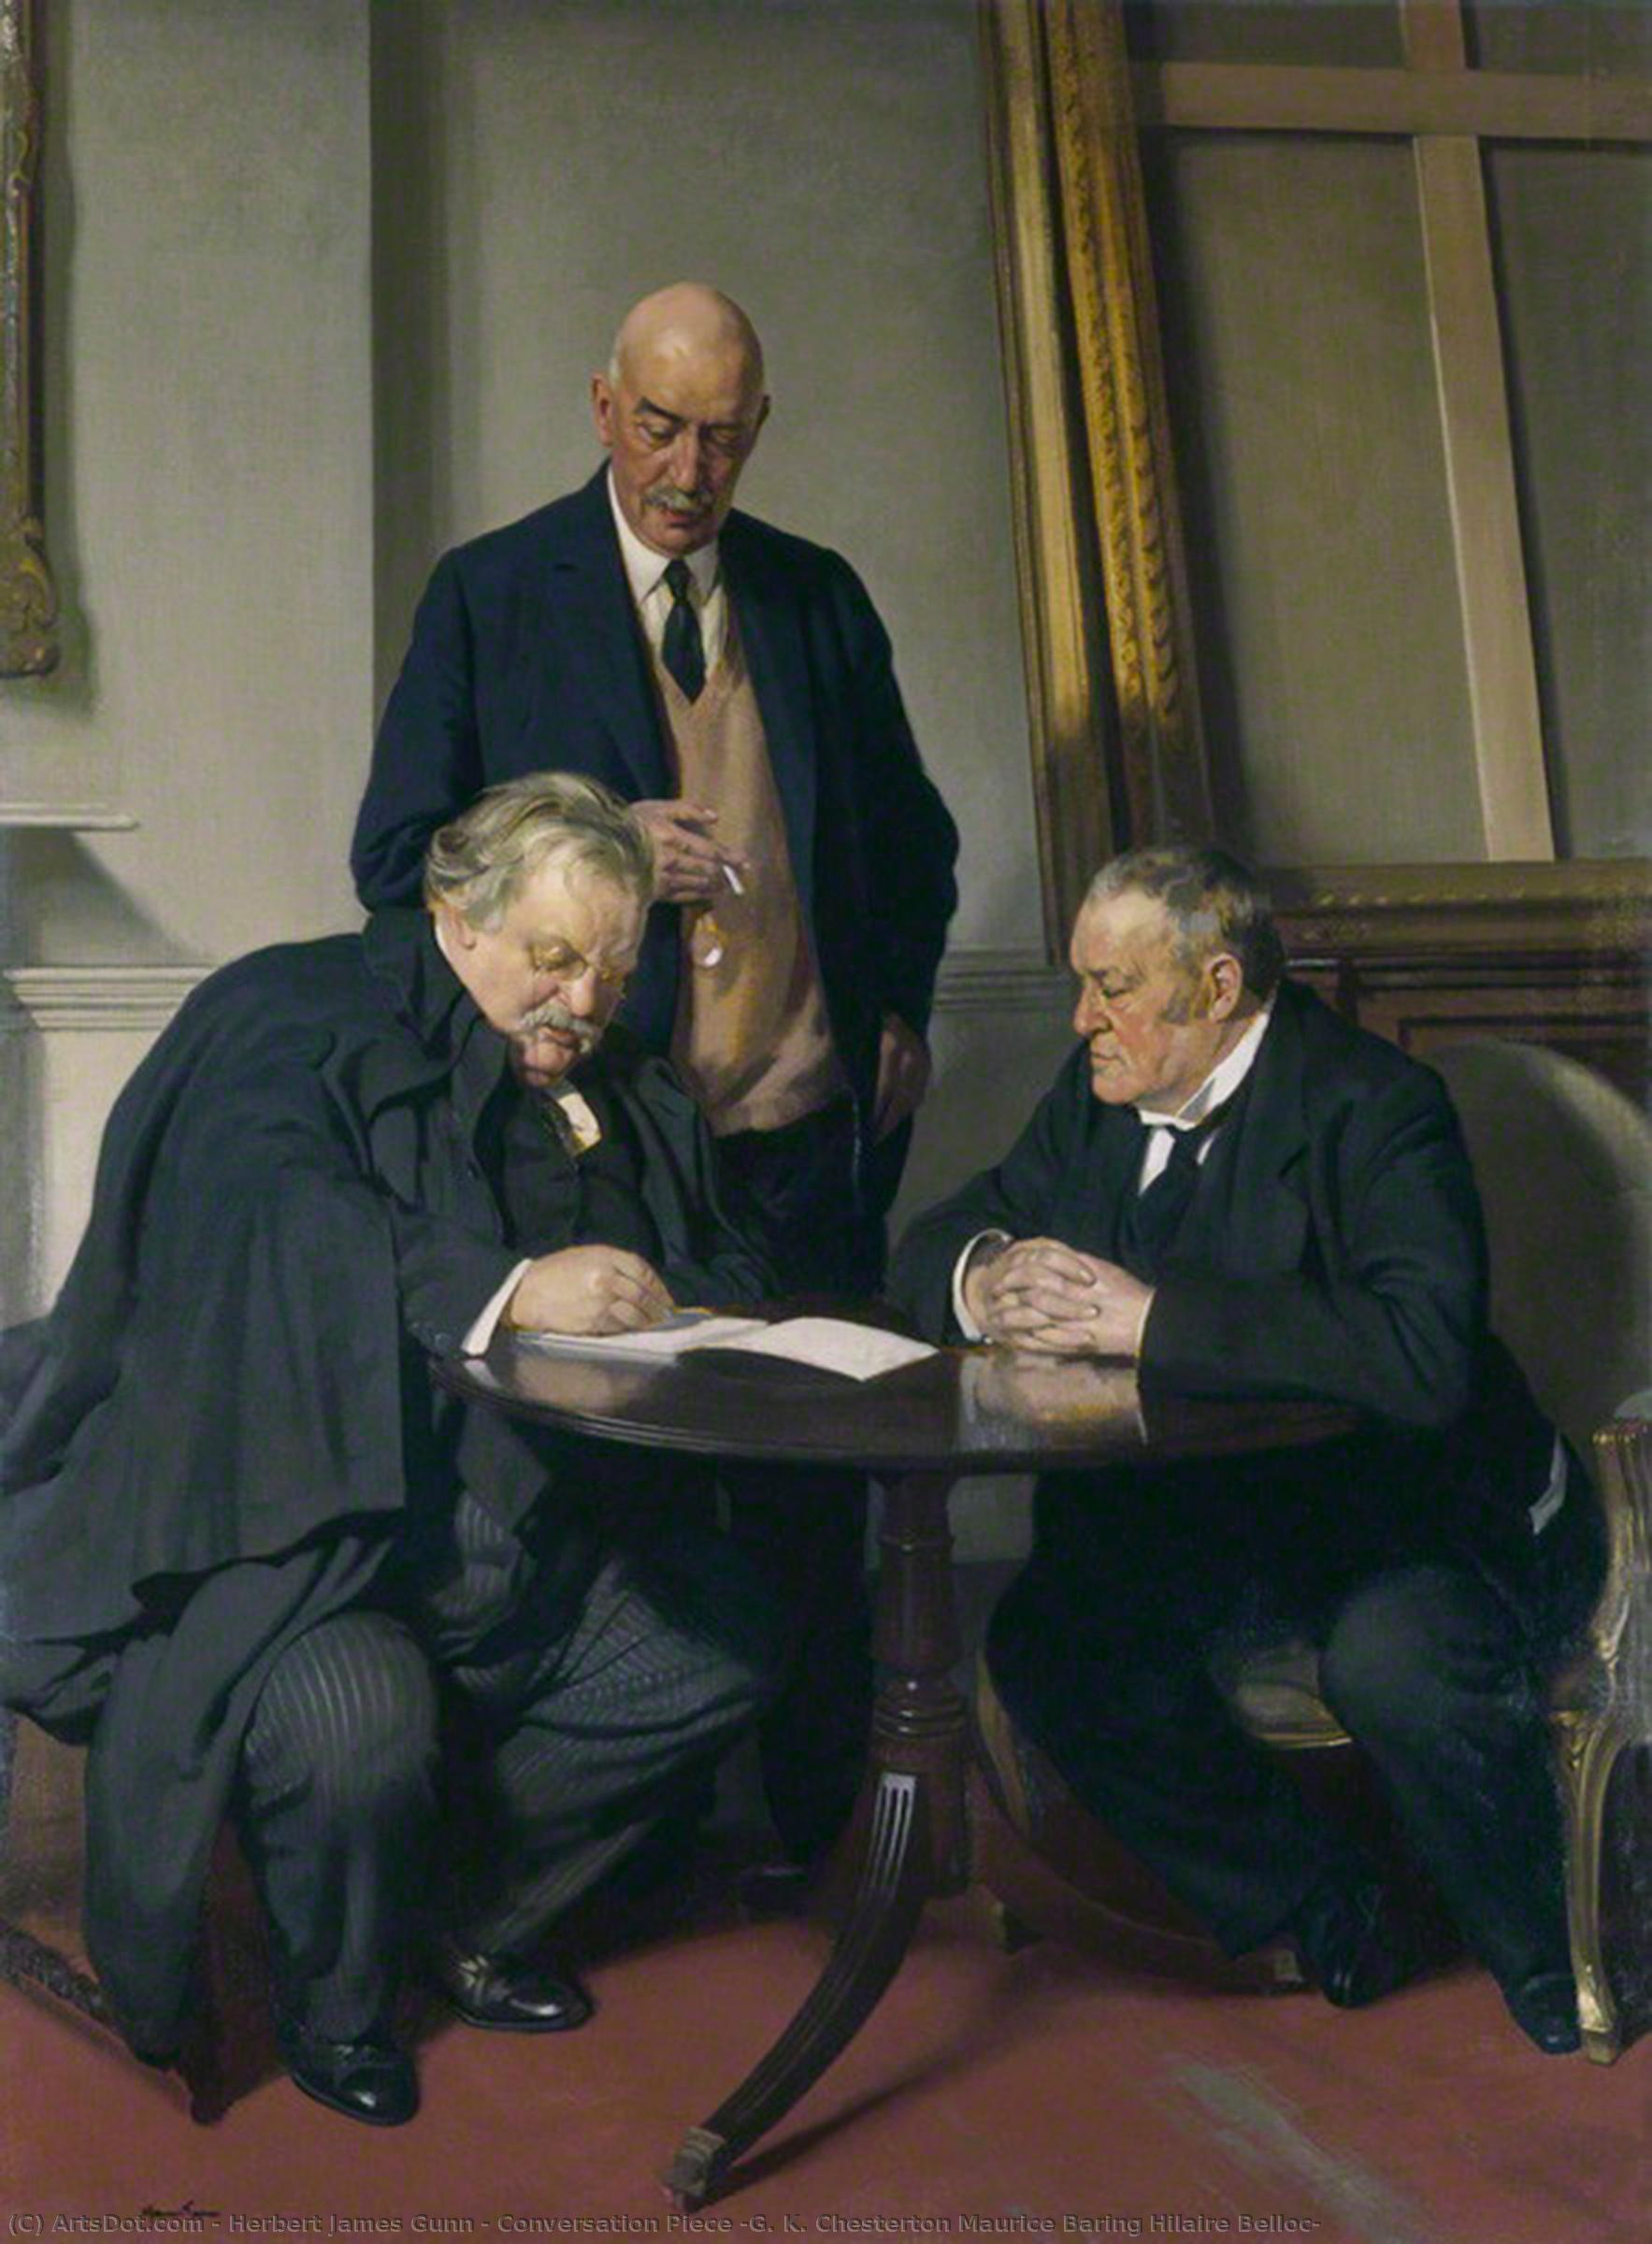 Wikioo.org - The Encyclopedia of Fine Arts - Painting, Artwork by Herbert James Gunn - Conversation Piece (G. K. Chesterton Maurice Baring Hilaire Belloc)